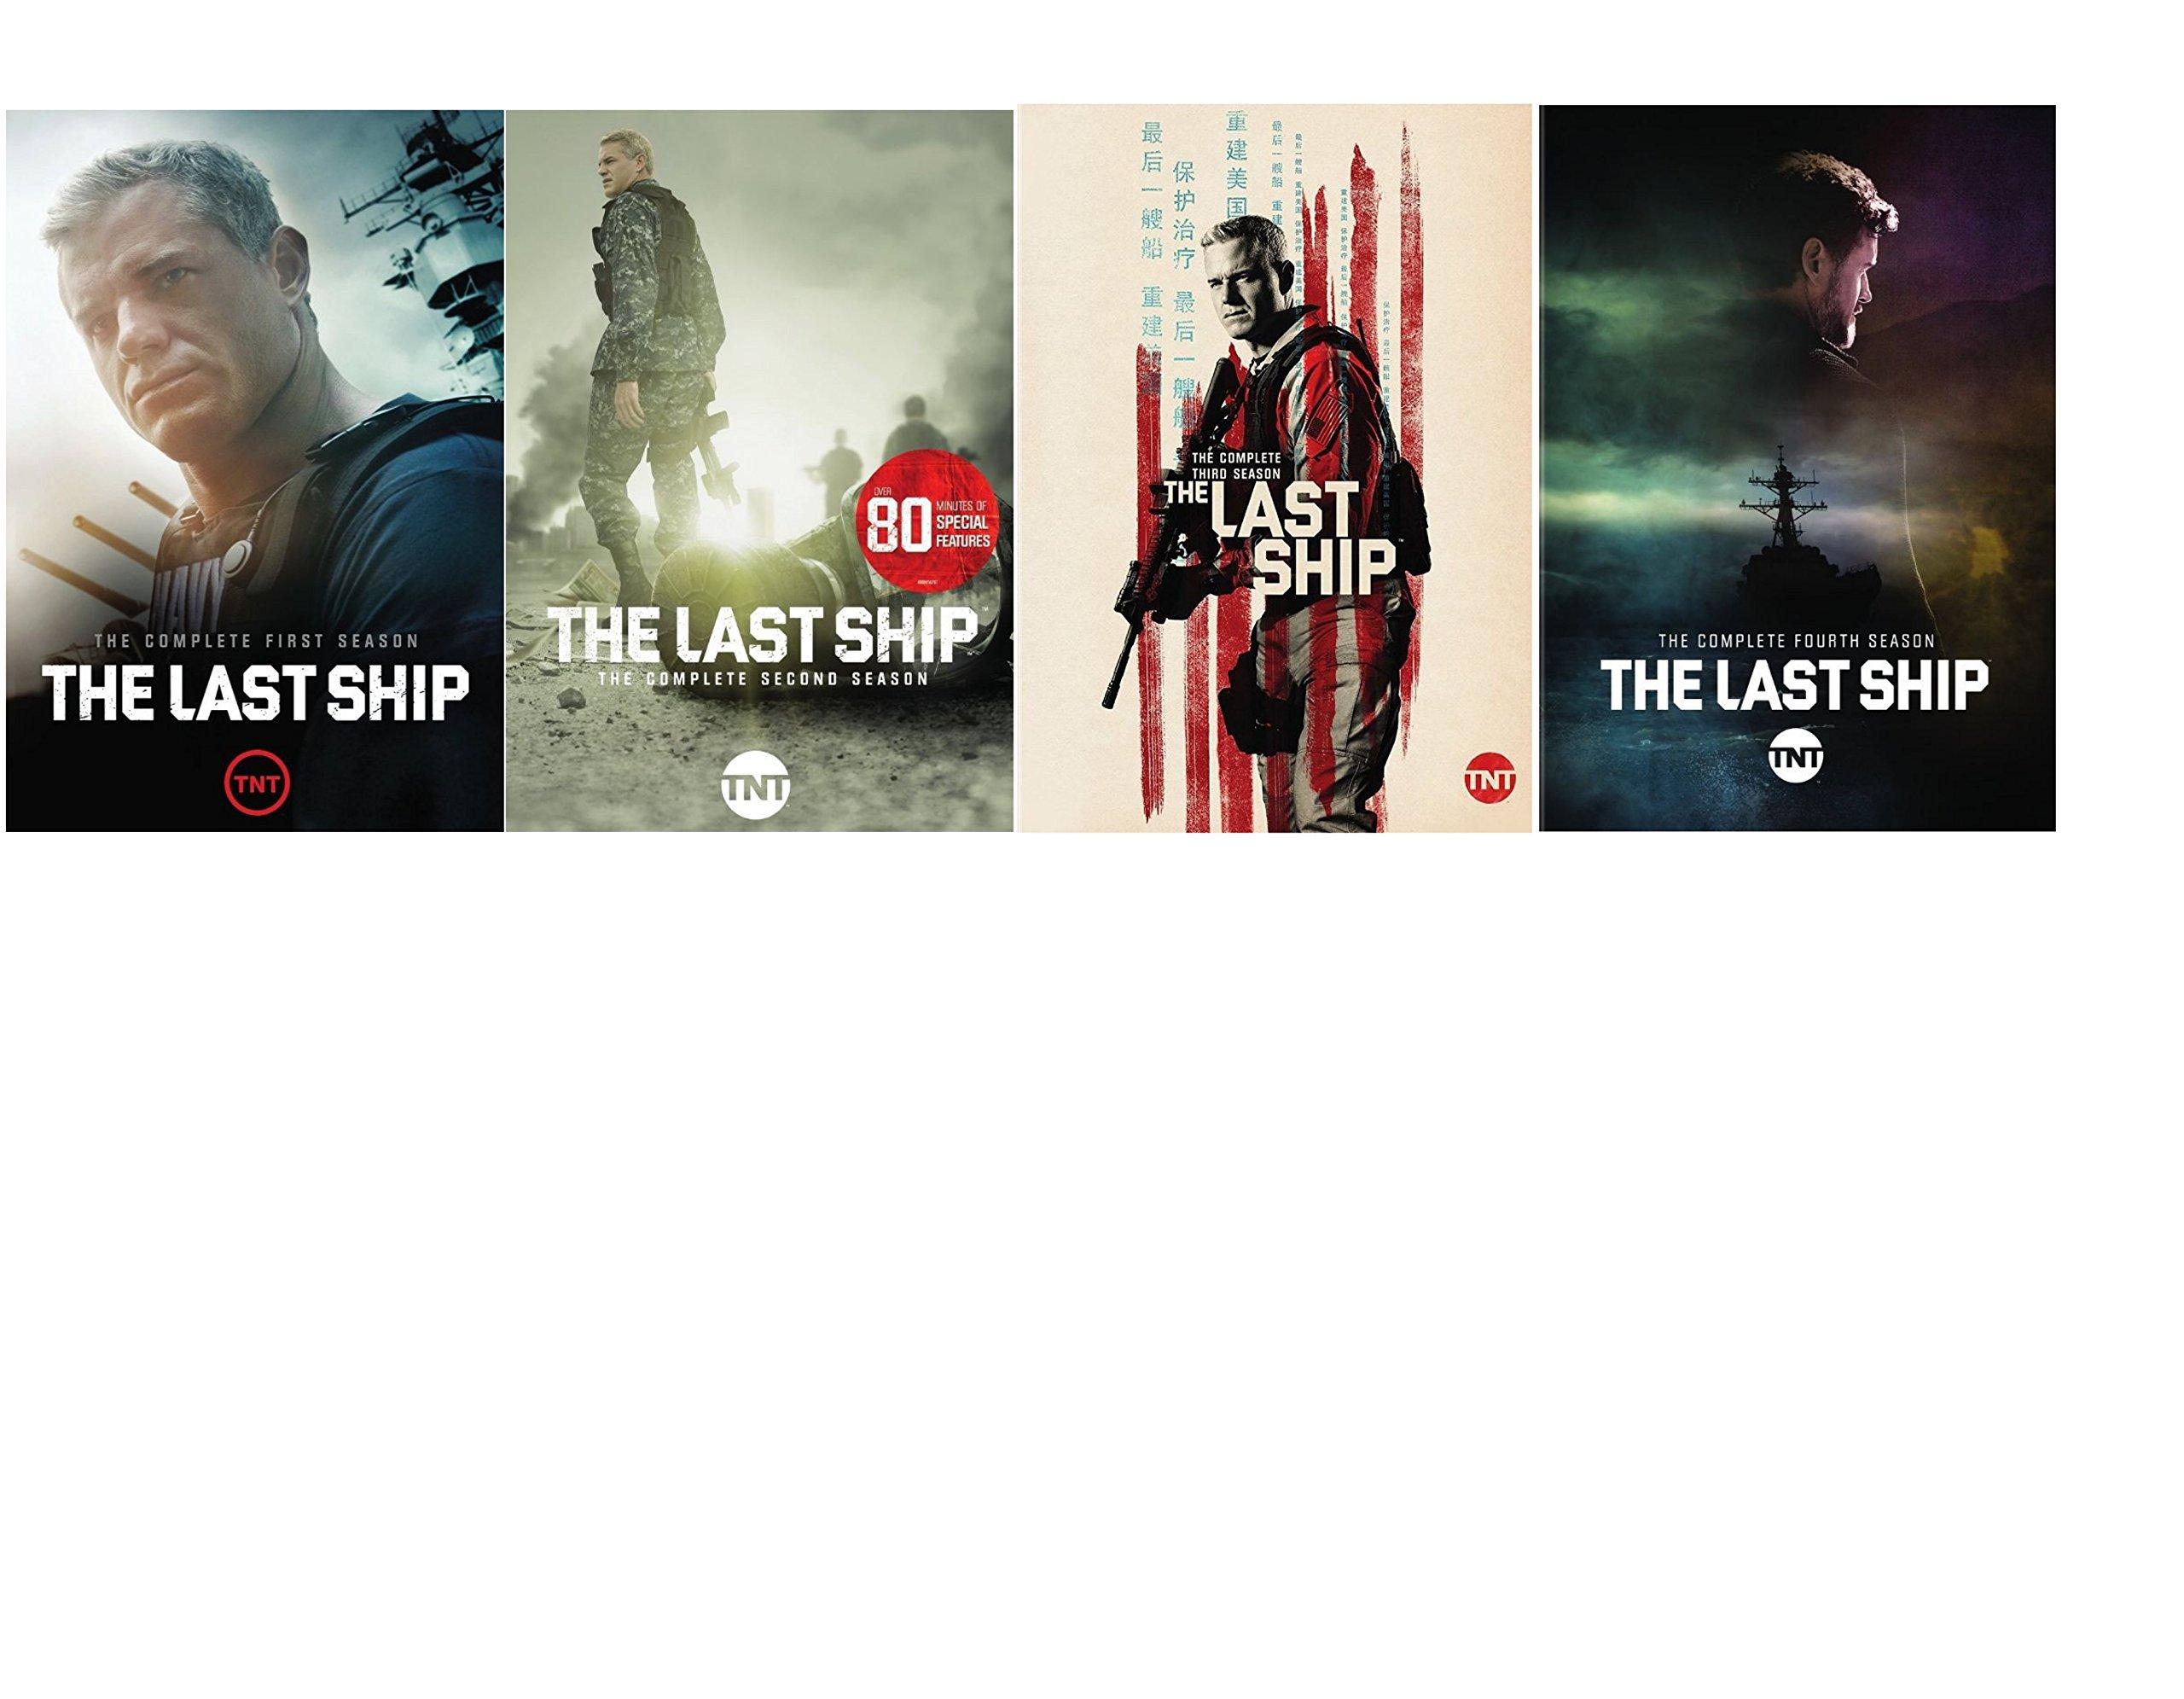 The Last Ship: Complete Seasons 1-4 DVD